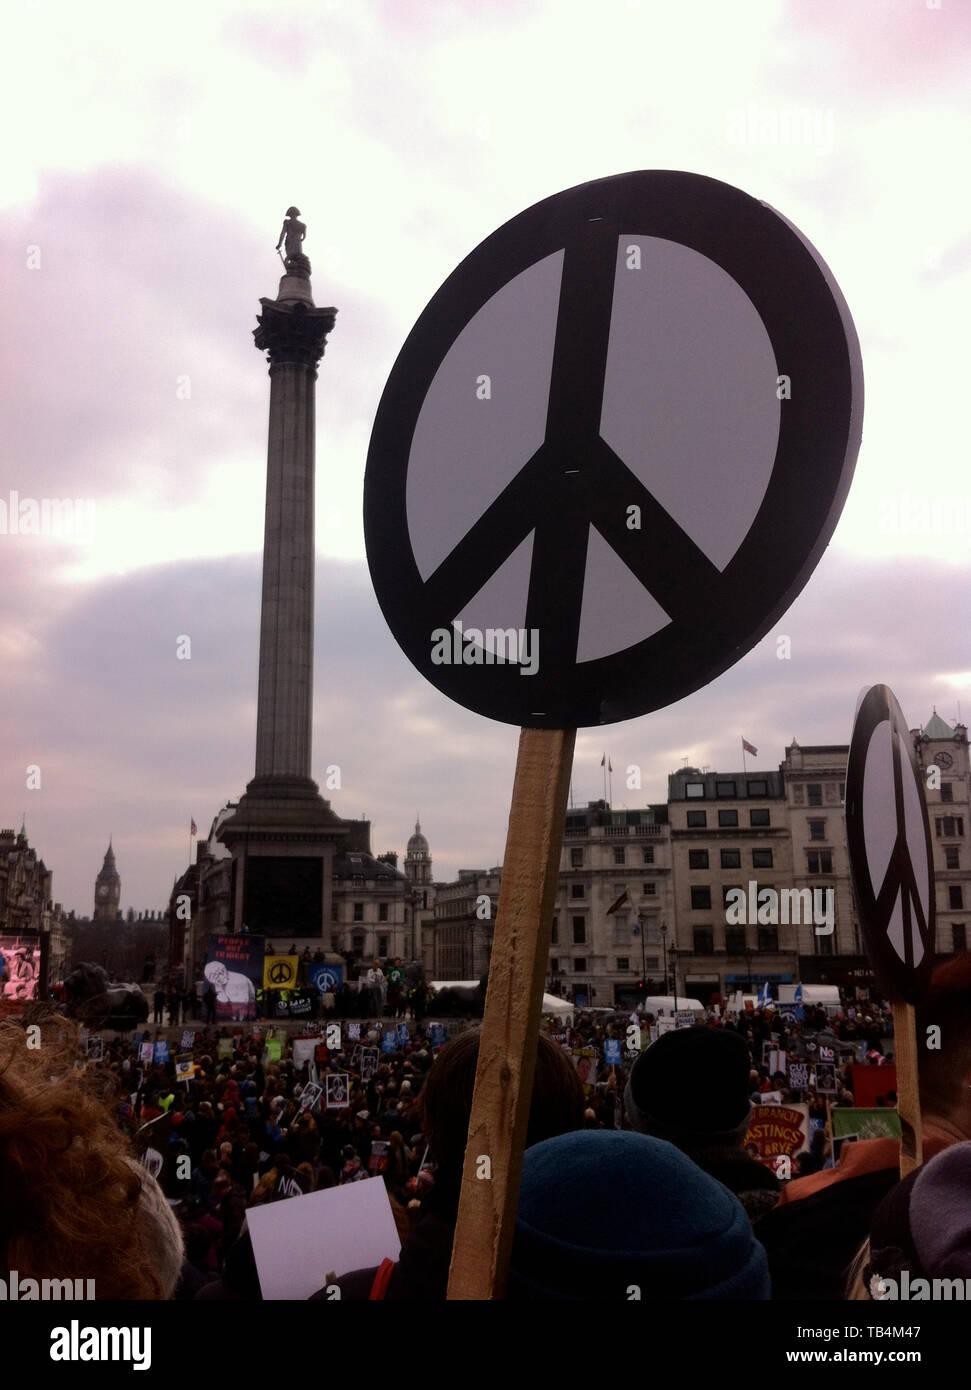 Trident CND rally, Londres, février 2016 Photo Stock